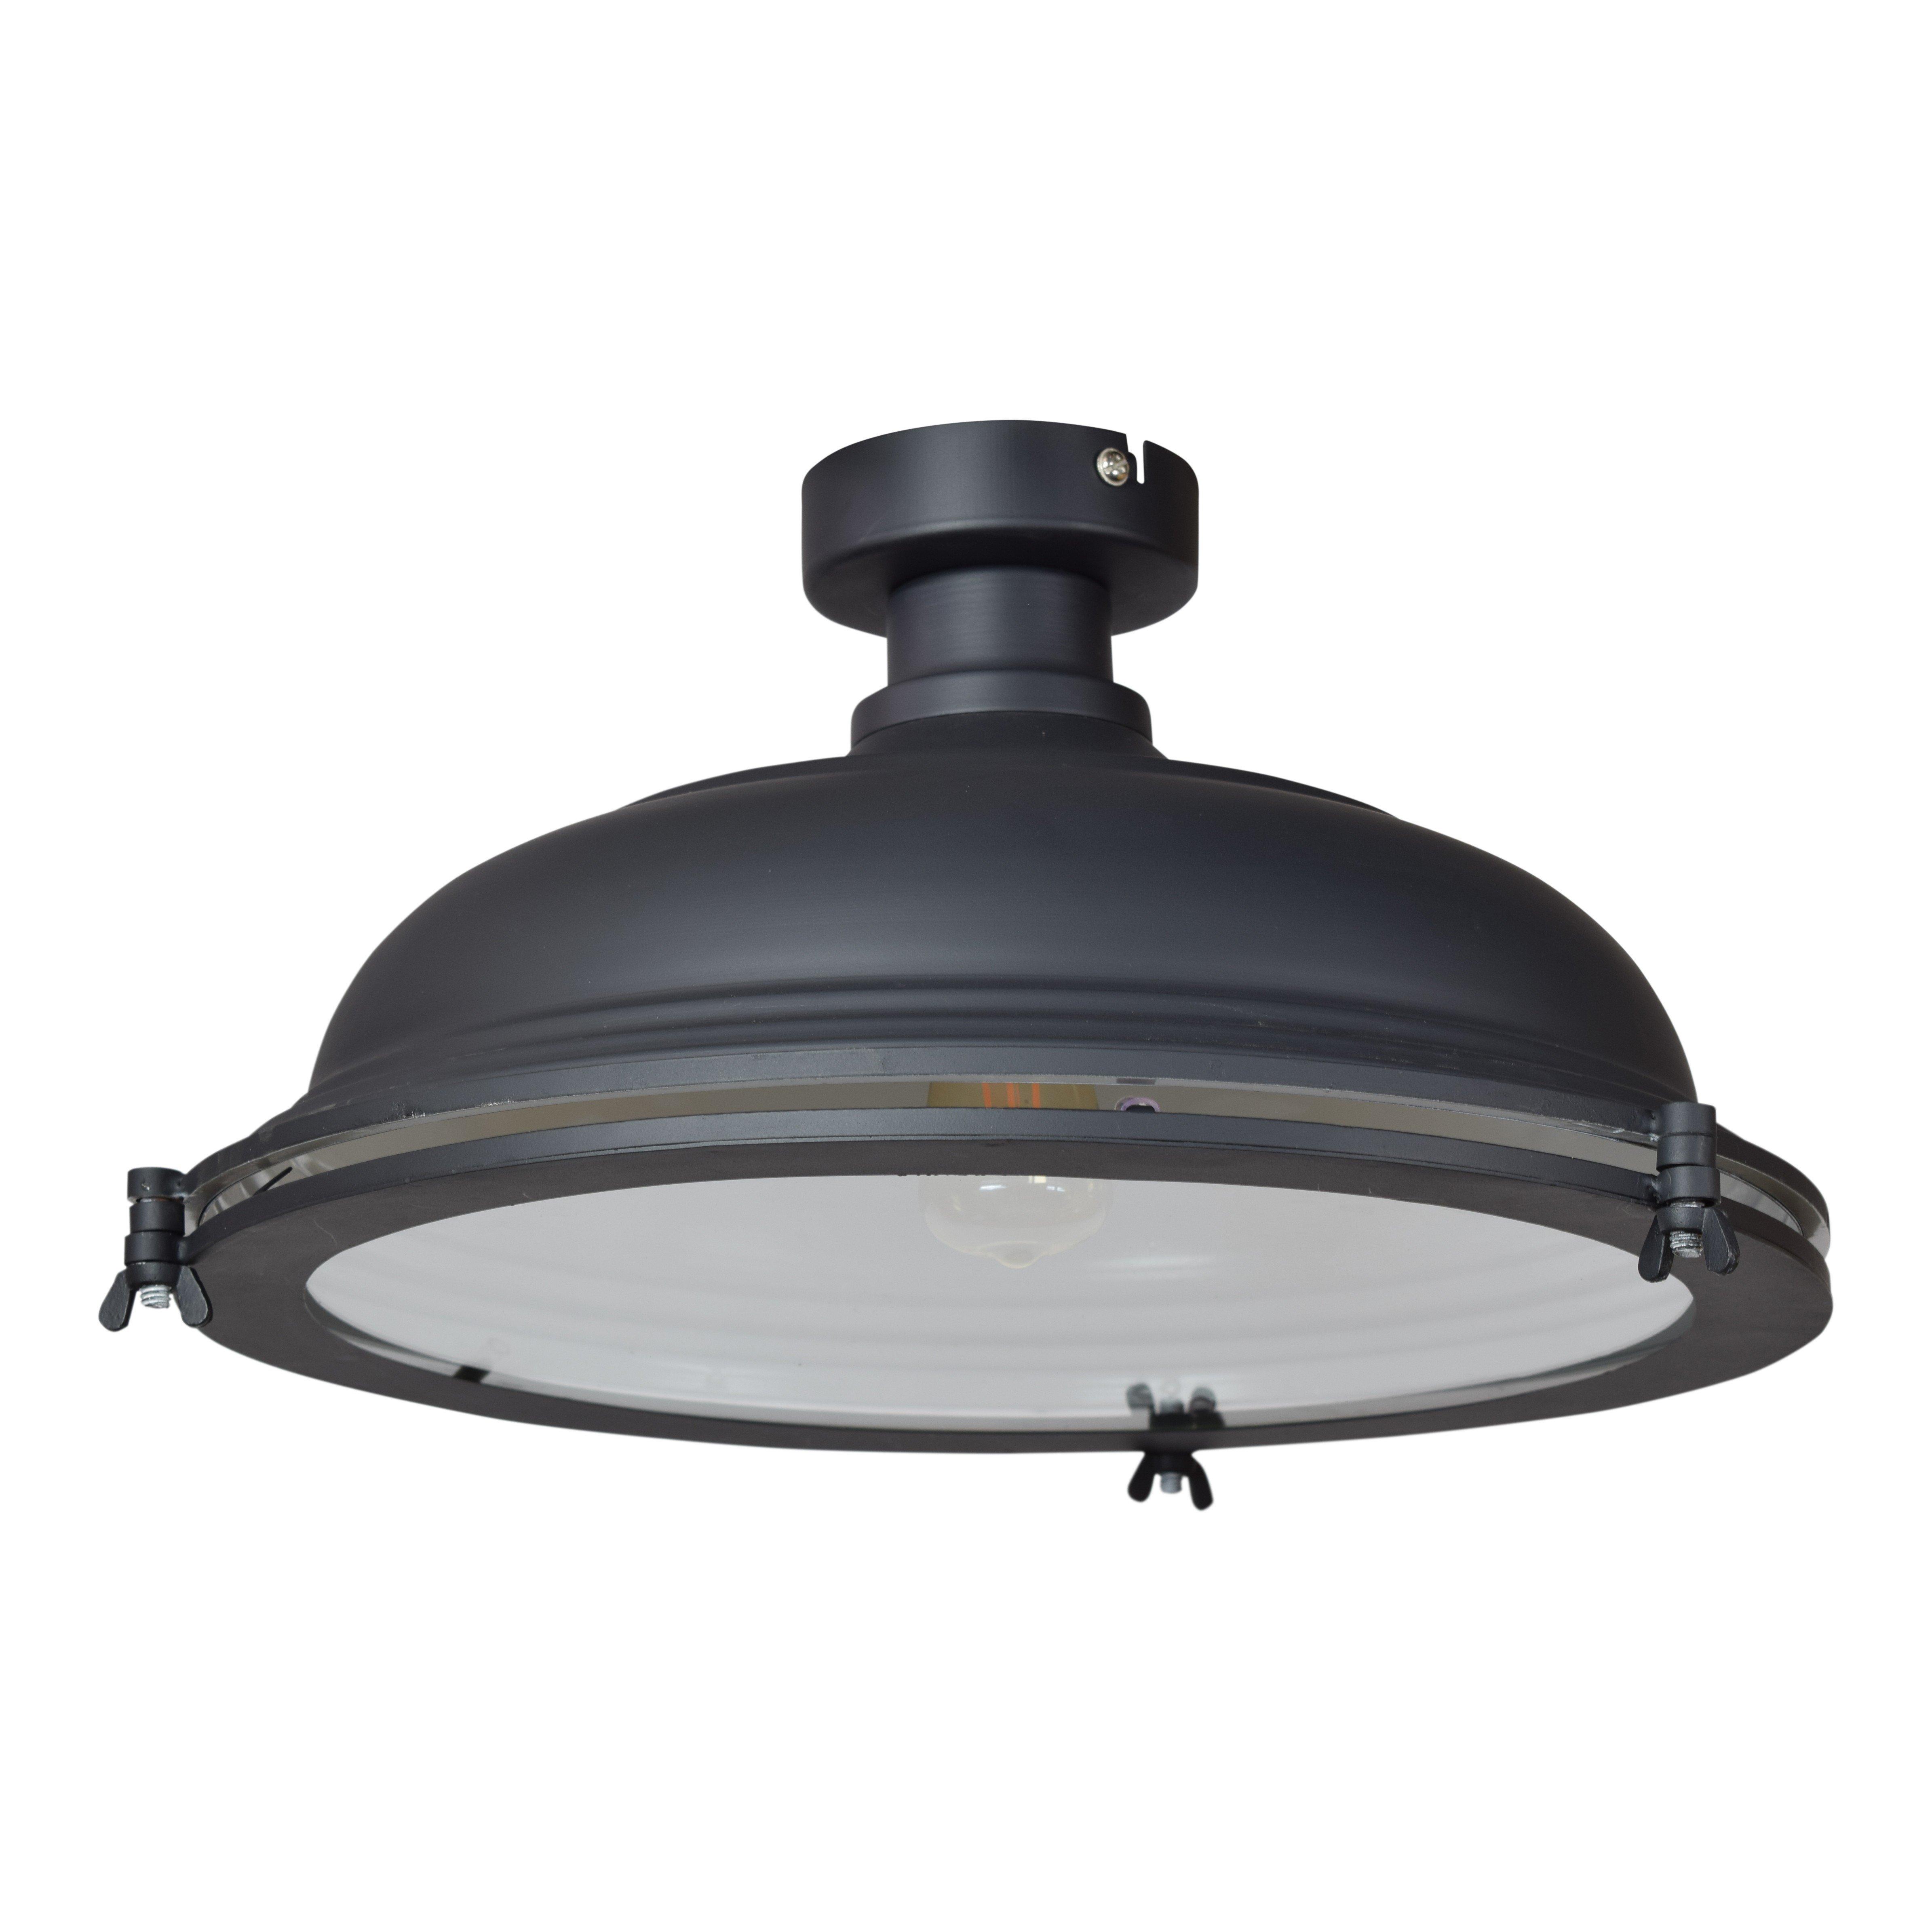 Urban Interiors Industriele plafondlamp Bronx Ur. AI-SL-270